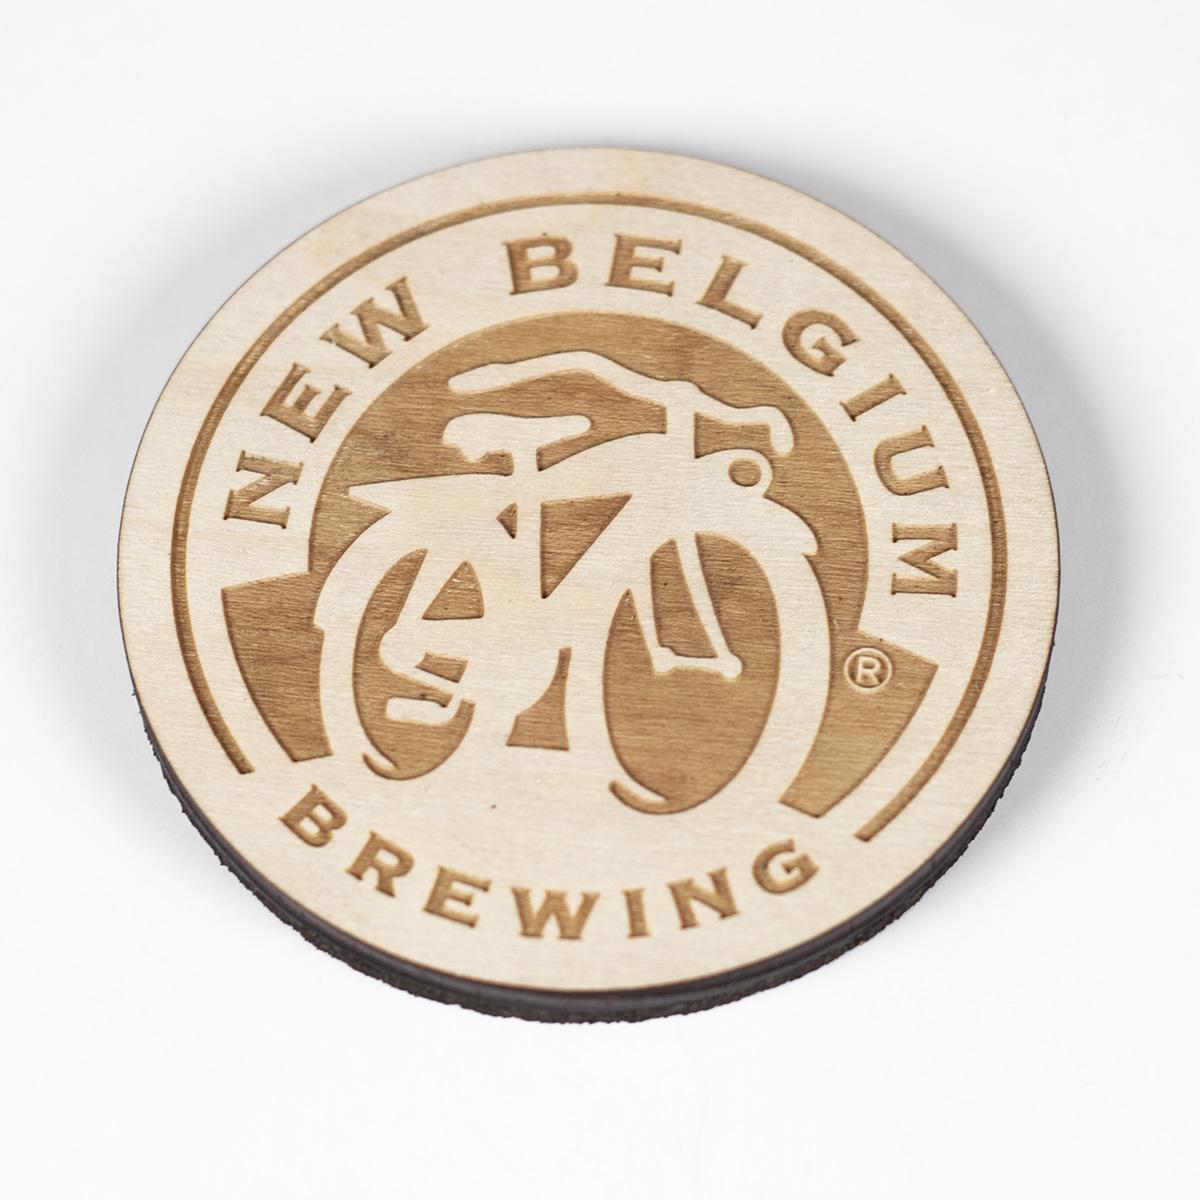 corporate-gifts-new-belgium-coaster.jpg